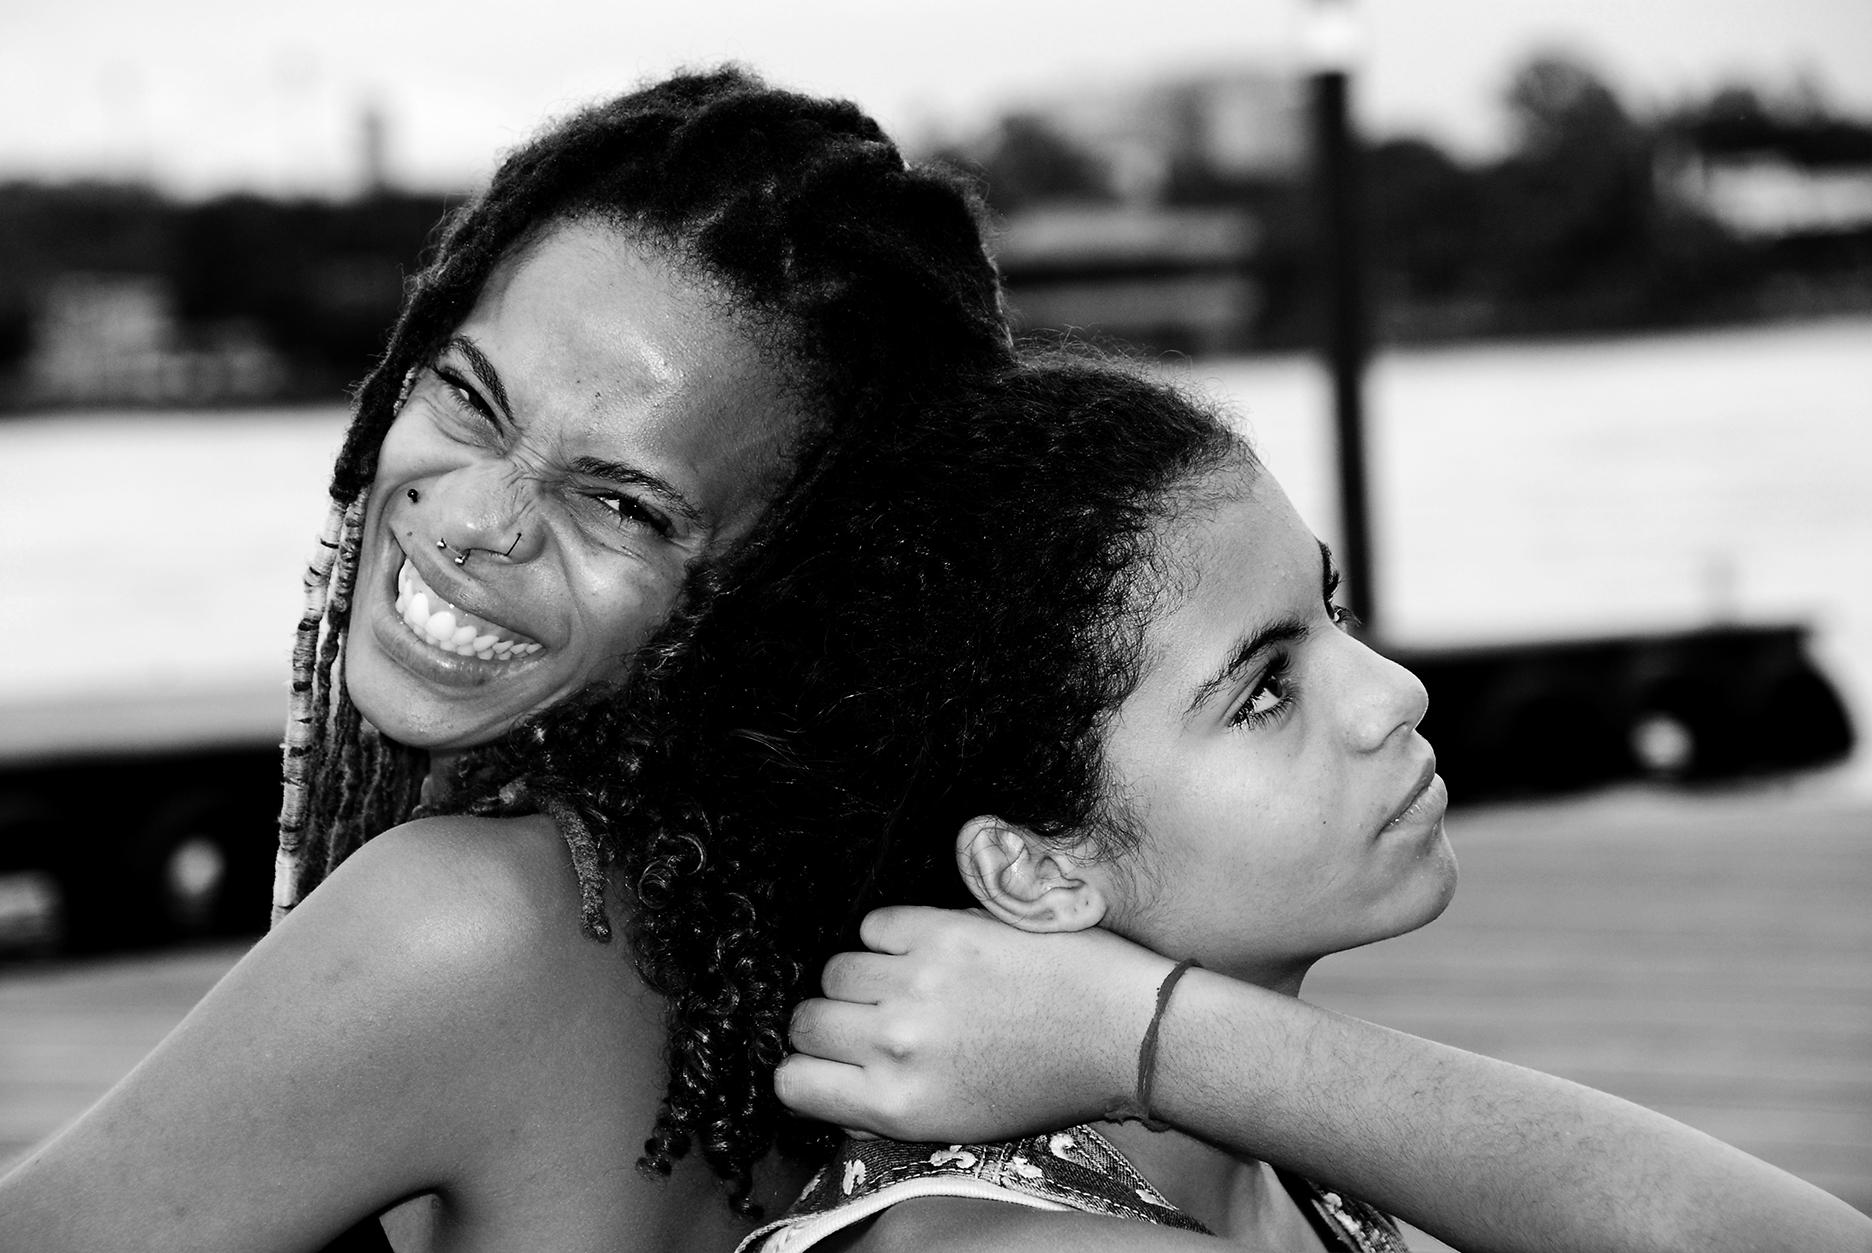 Priscila et Camila, Portrait d'amour intimee